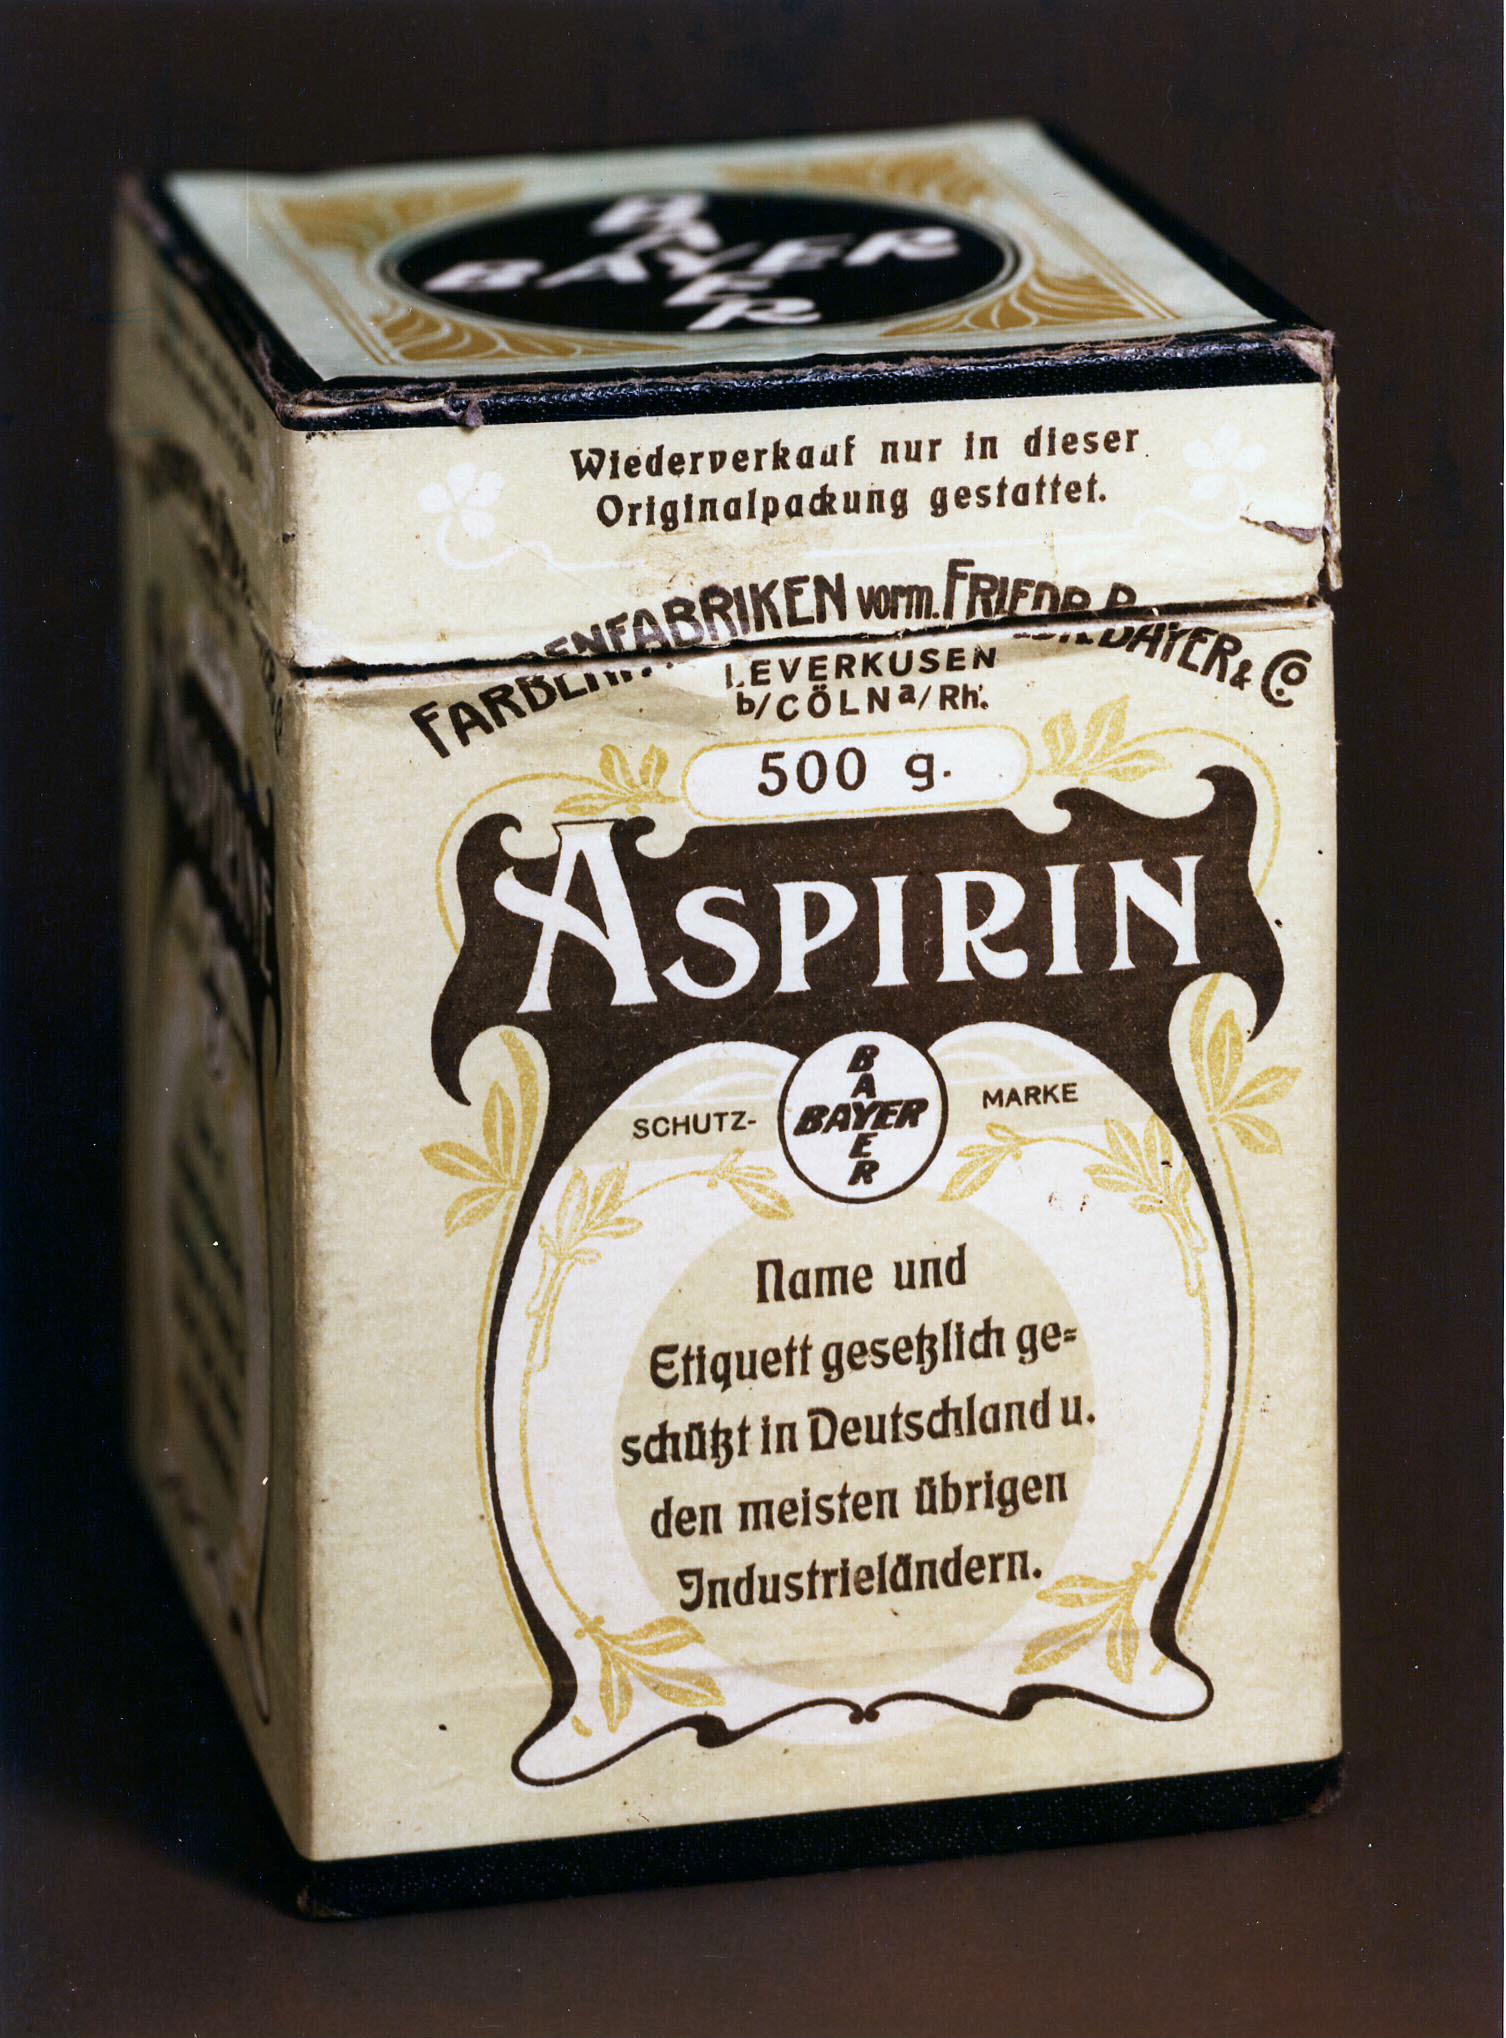 La 'Aspirina' cumple 120 años